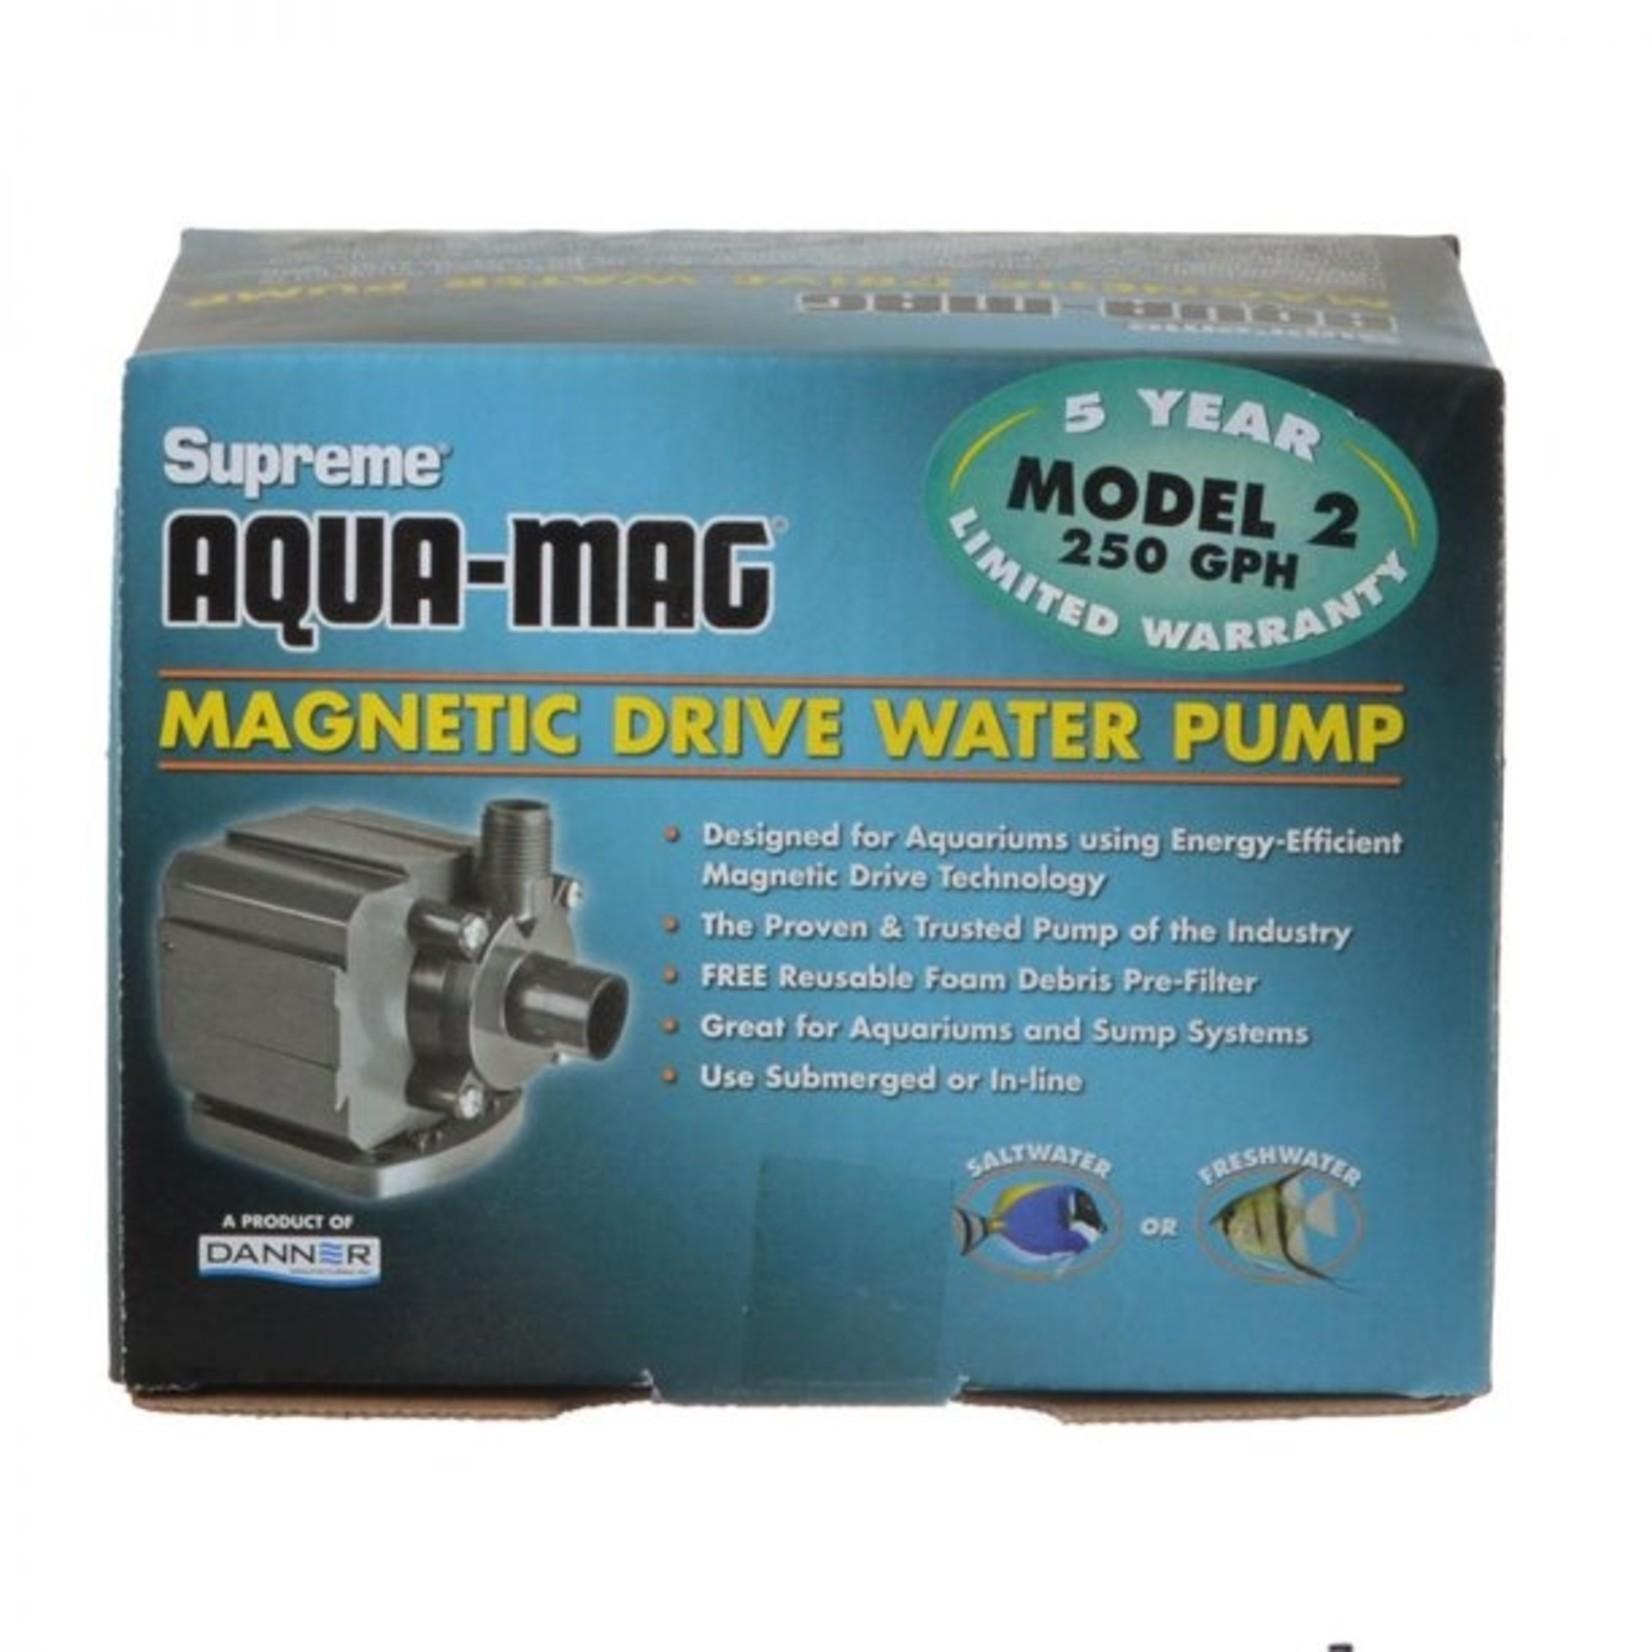 MAG DRIVE SUPREME CLASSIC 2 250 GPH PUMP